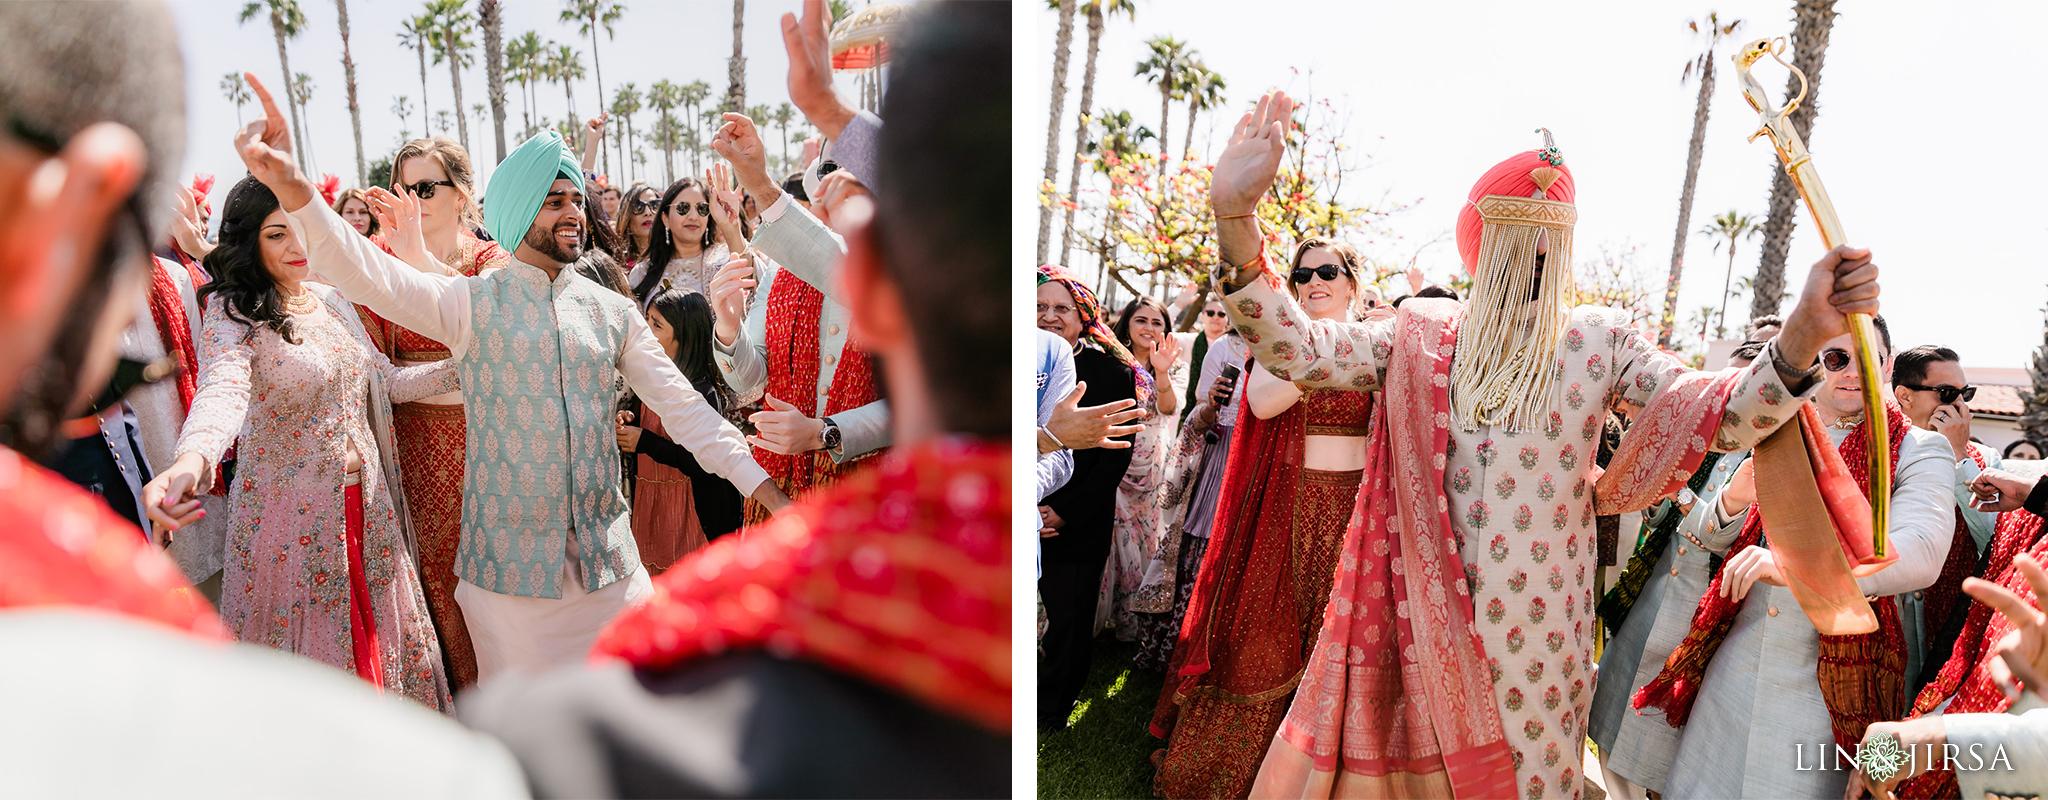 34 Hilton Santa Barbara Beachfront Resort Indian Wedding Baraat Photography